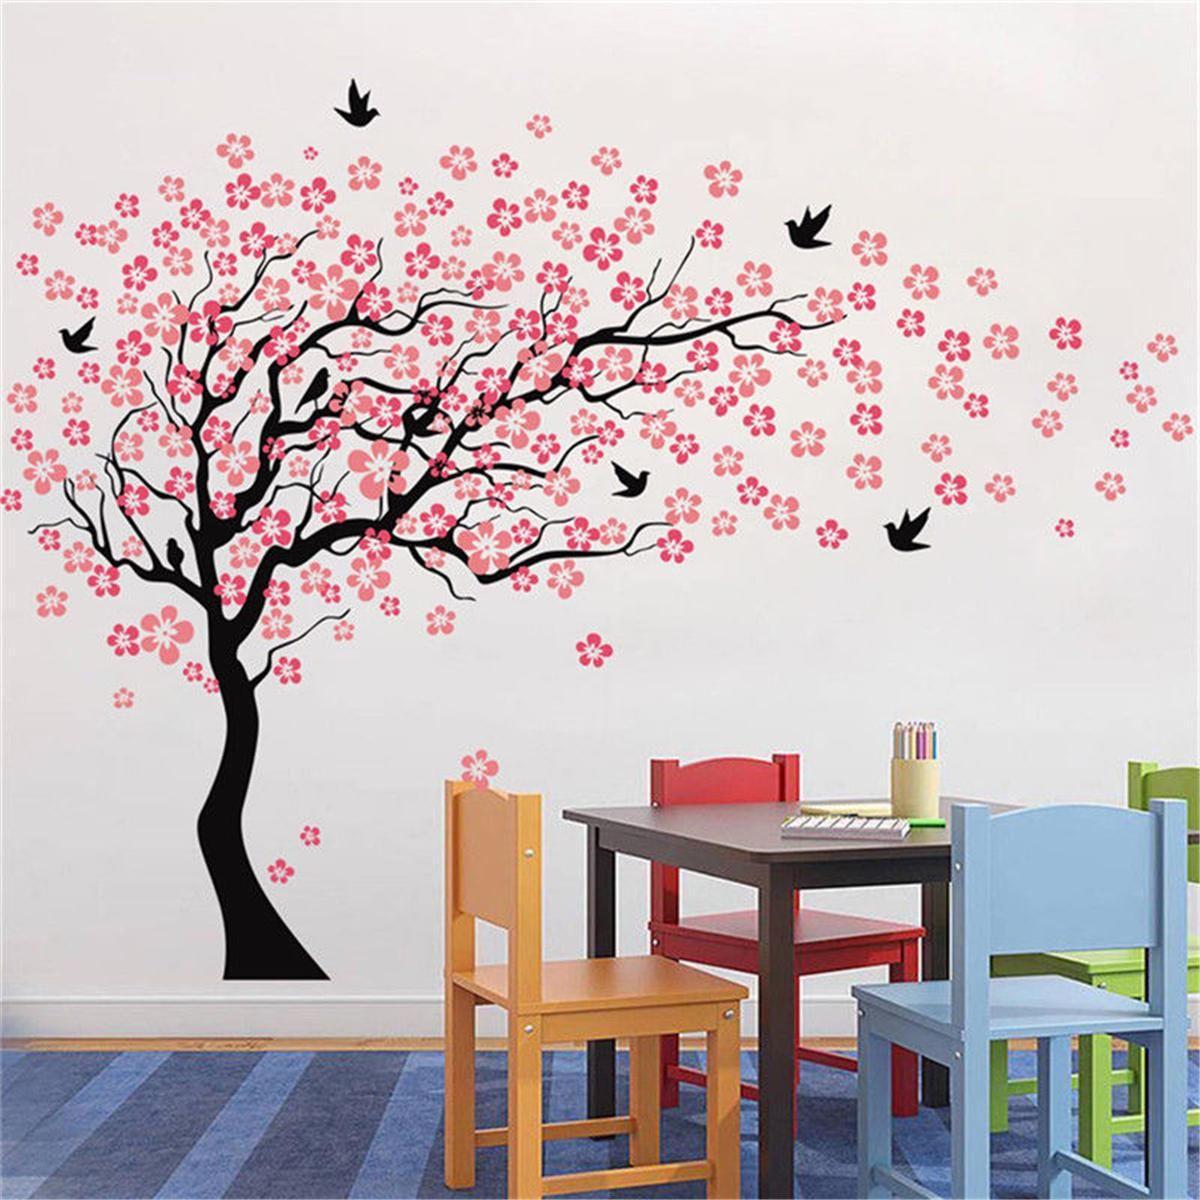 Large Wall Tree Baby Nursery Flower Wall Sticker Cherry Blossom Sticker Kids Vinyl Art Decal Cherry Blossom Wall Art Tree Wall Painting Tree Wall Decal